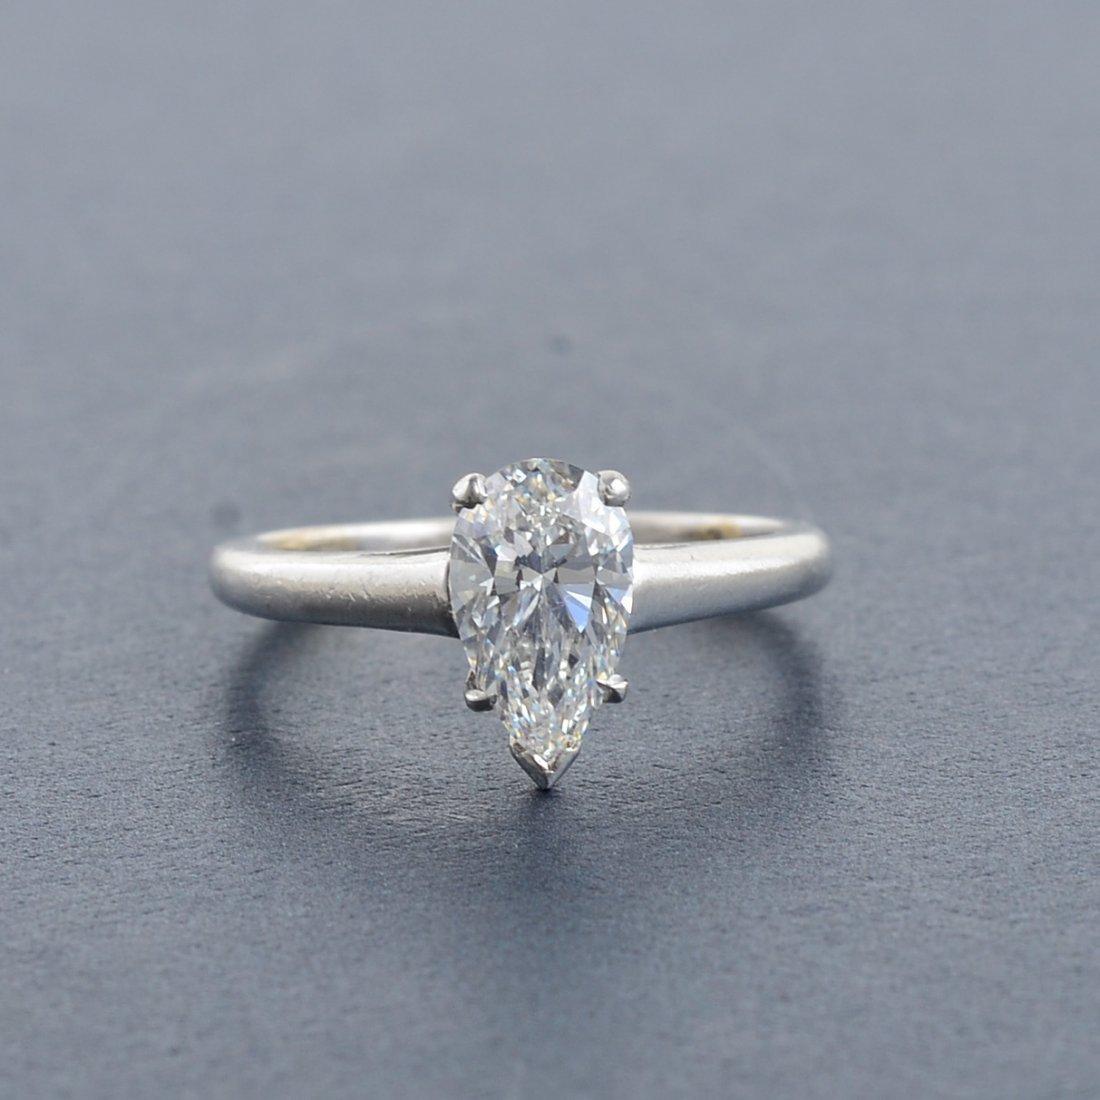 352: Tiffany Platinum Diamond Engagement Ring